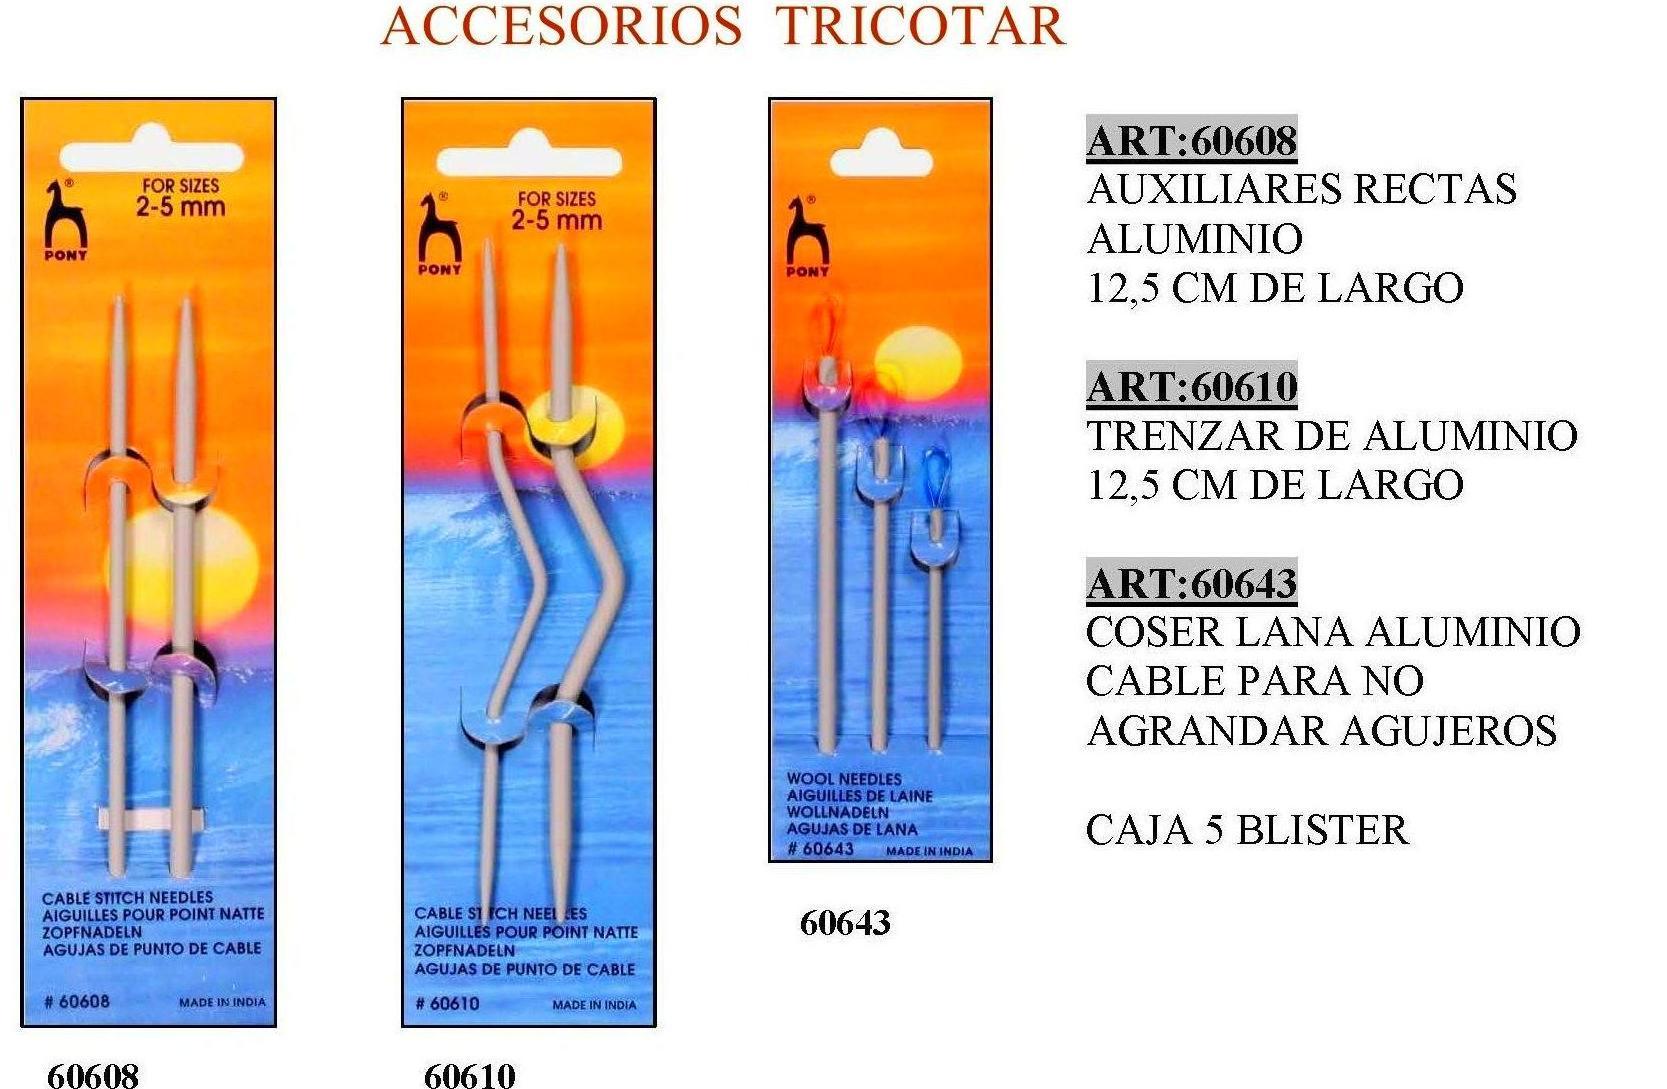 ACCESORIOS TRICOTAR ALUMINIO